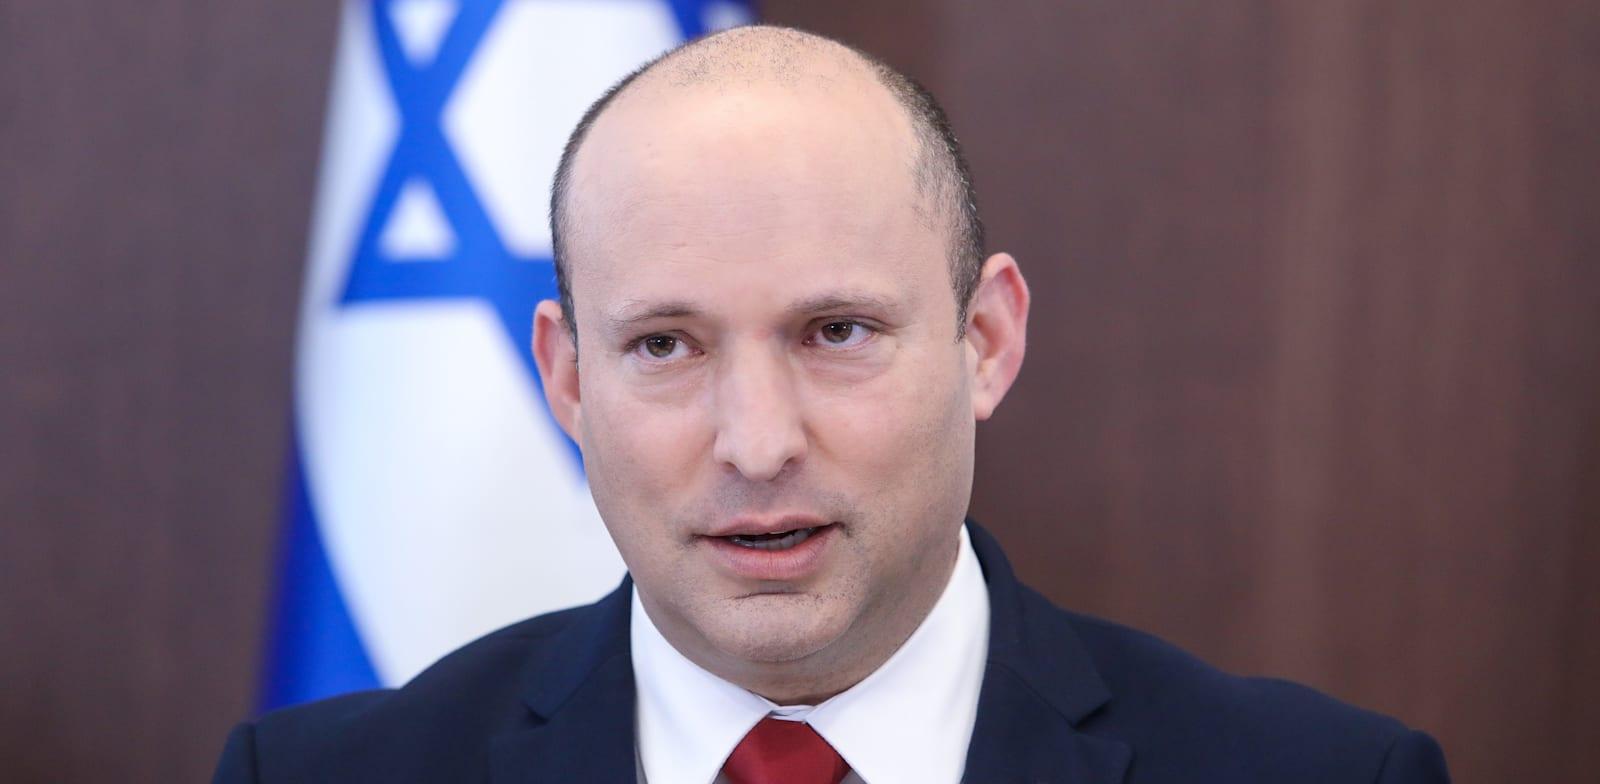 Naftali Bennett Photo: Jerusalem Post Marc Israel Sellem